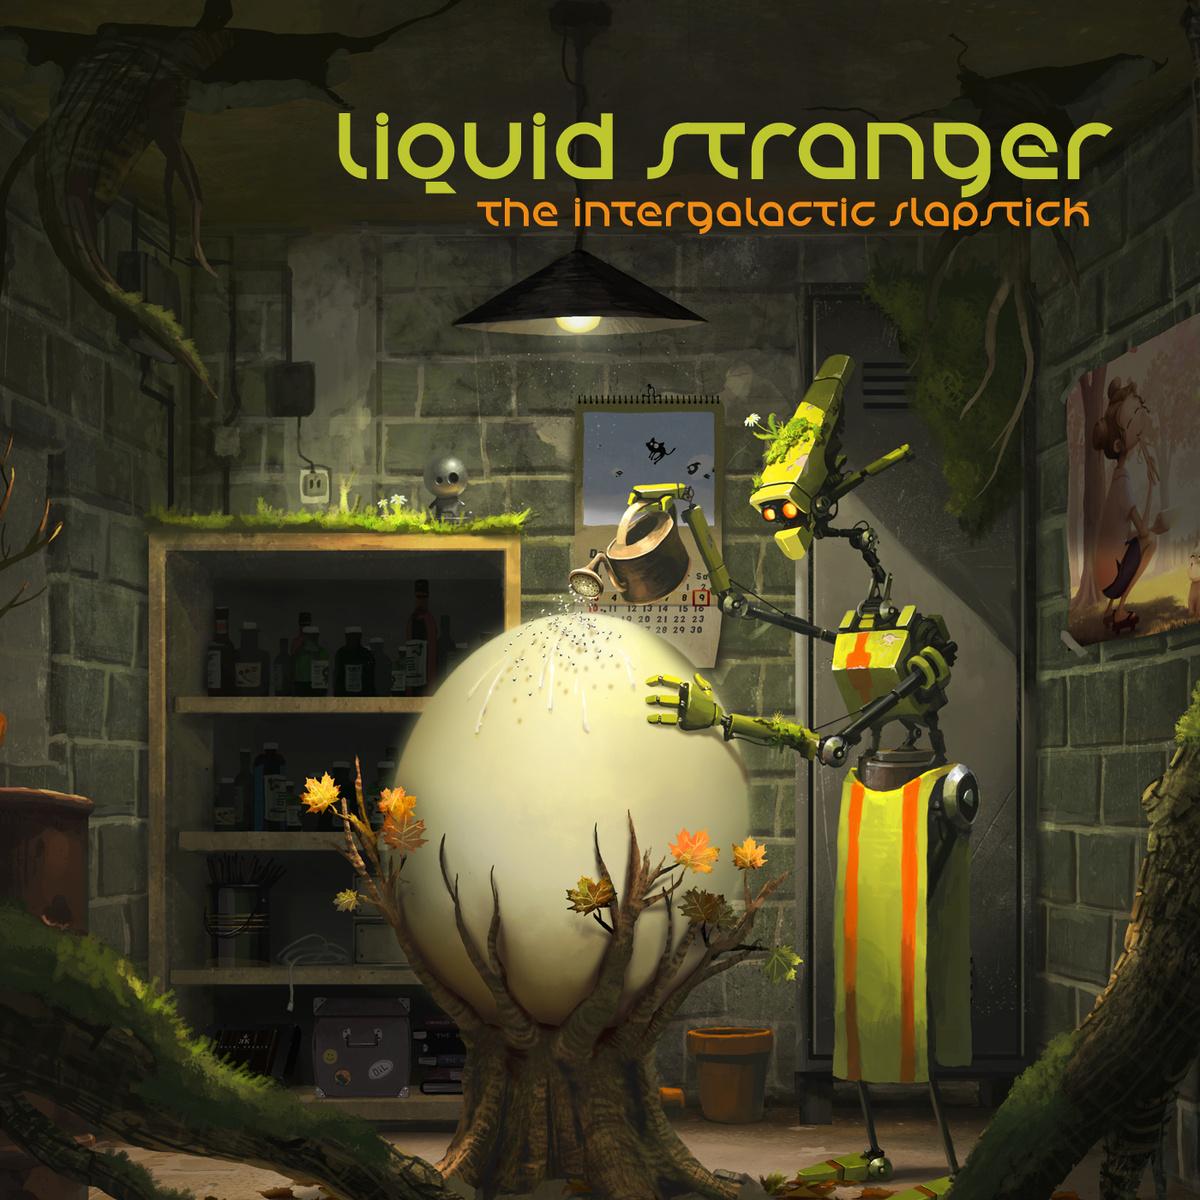 Liquid Stranger The Intergalactic Slapstick Interchill Cd